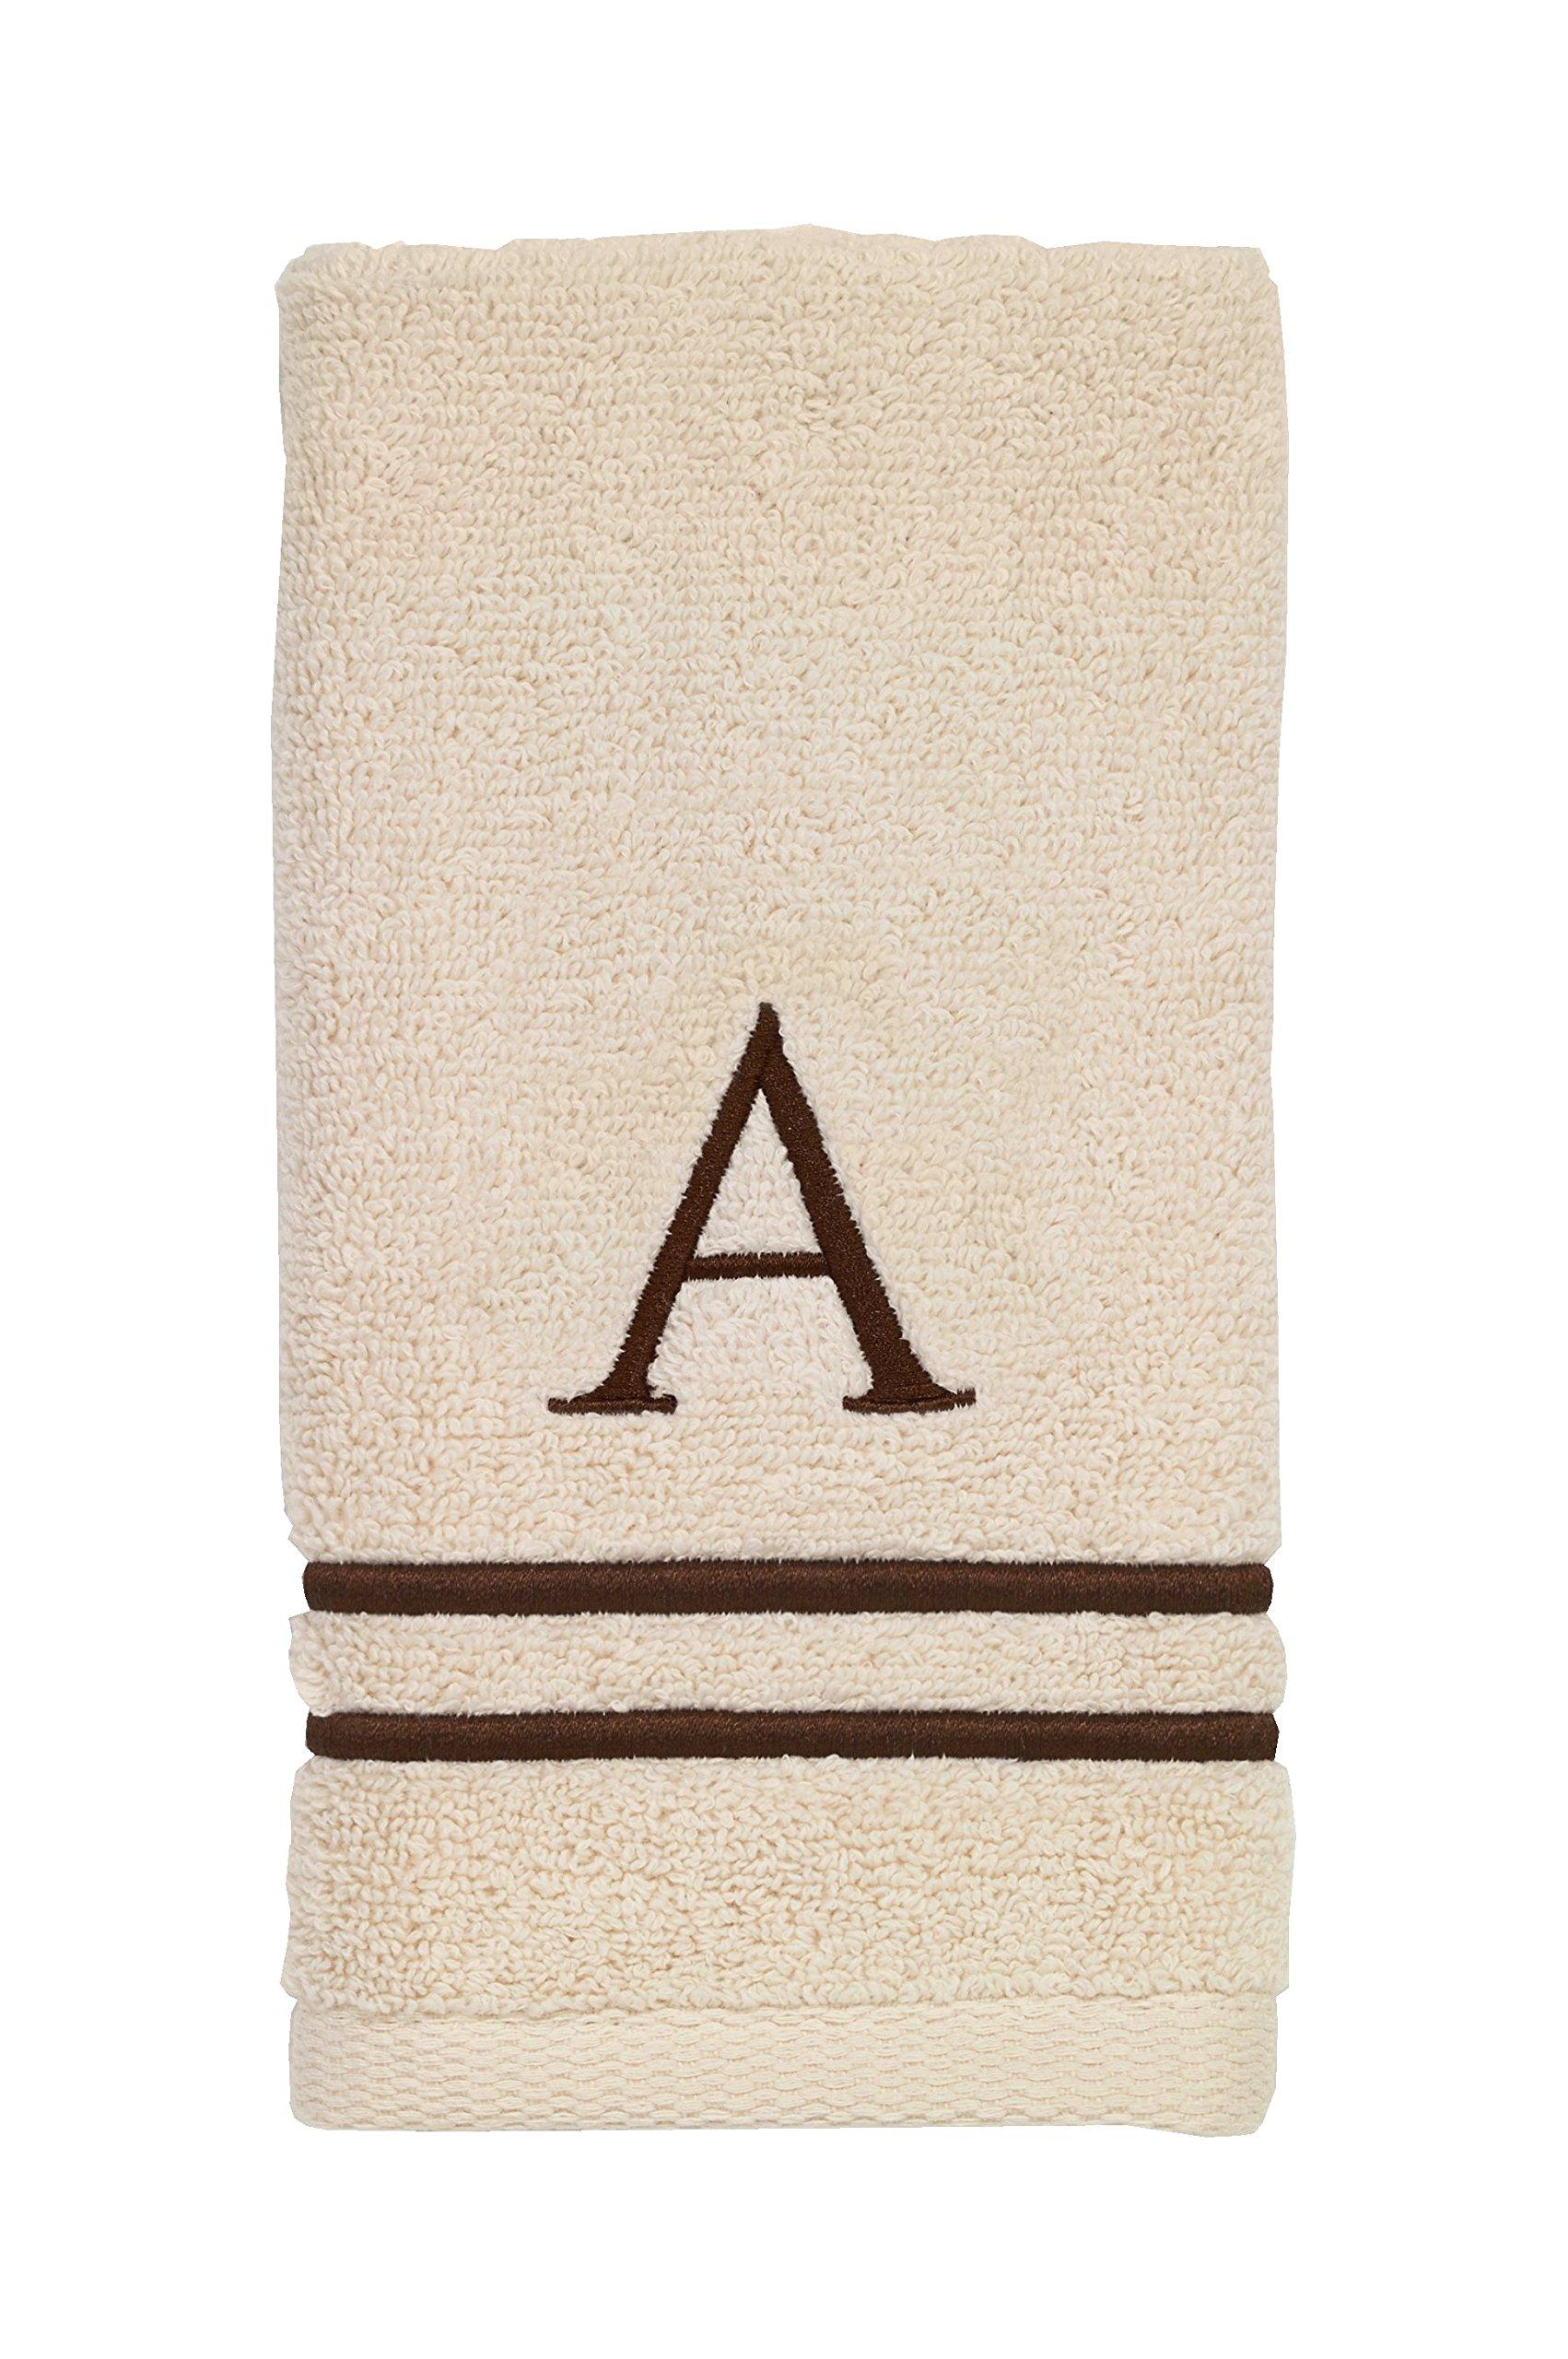 Avanti Linens 050874A Block Monogram Finger Towel, Medium, Ivory/Mocha